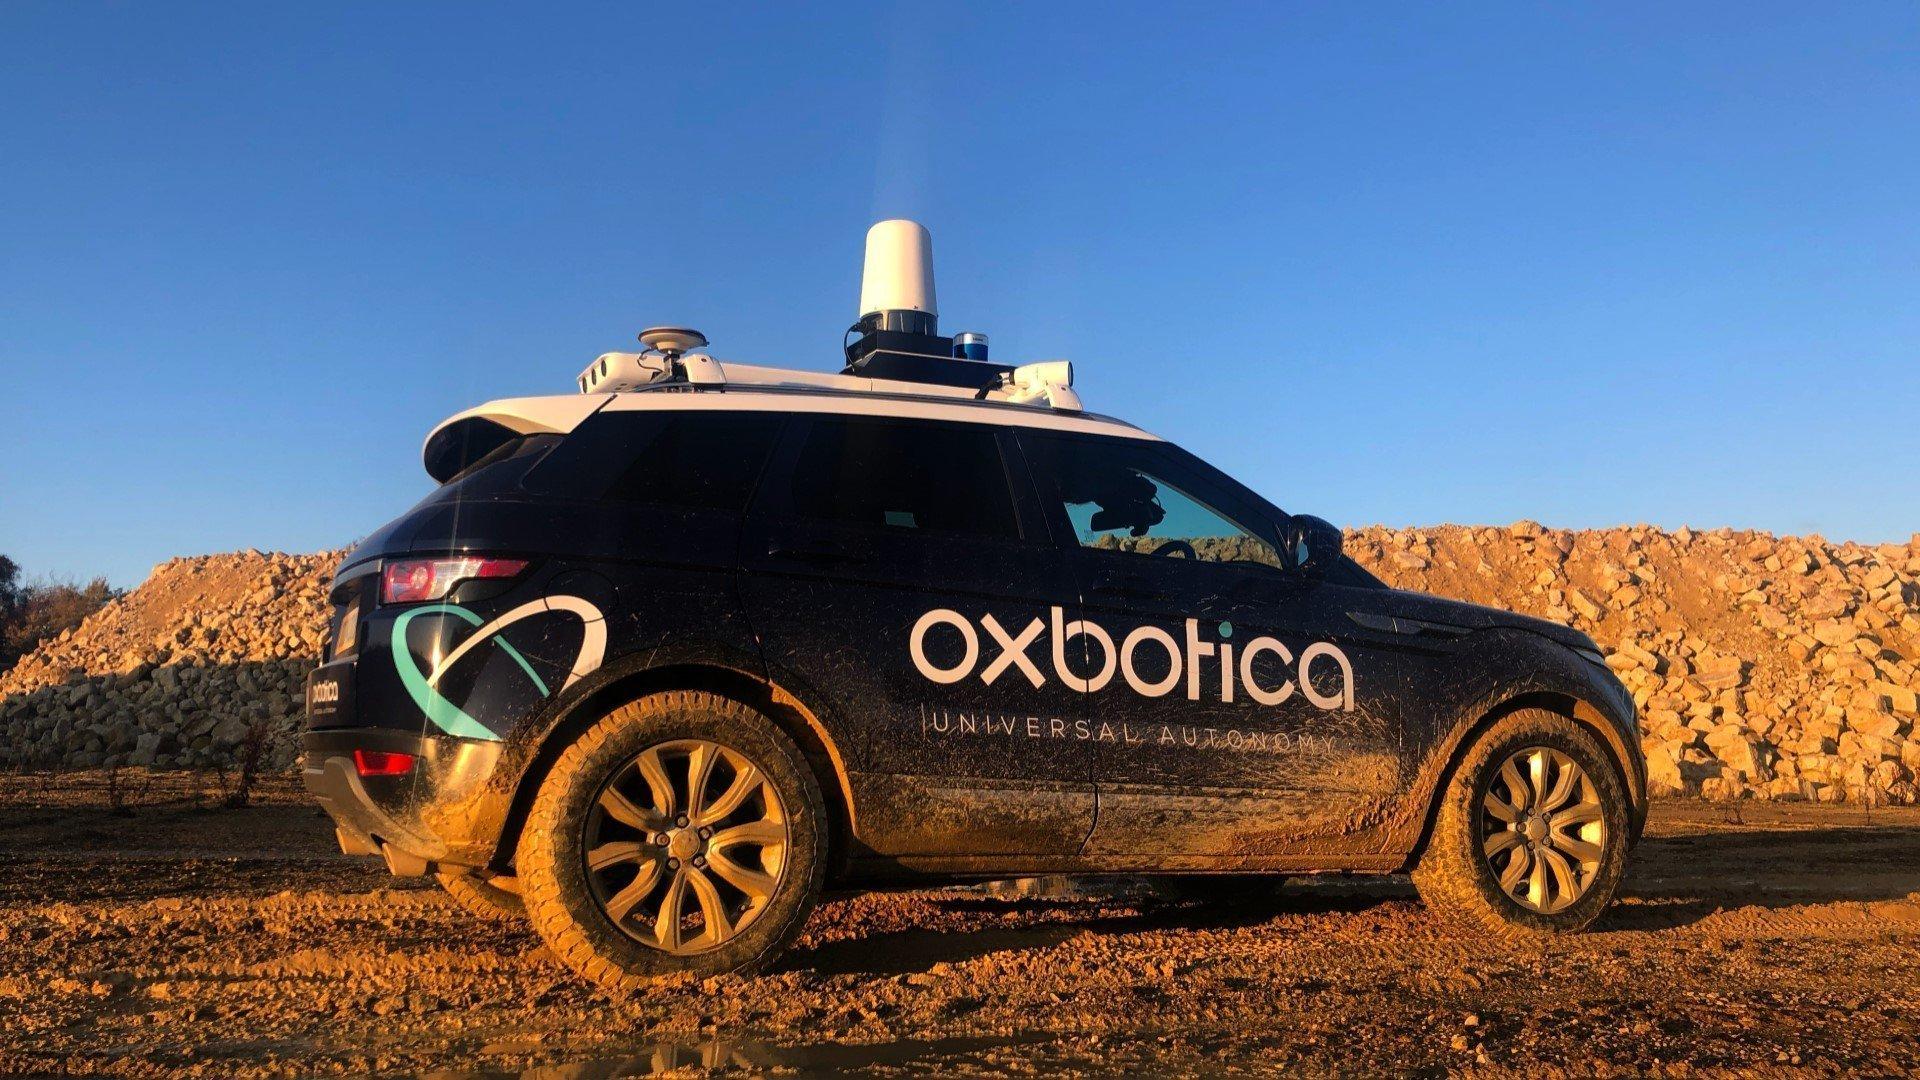 Oxbotica raises $47m to deploy autonomy software platform around the world